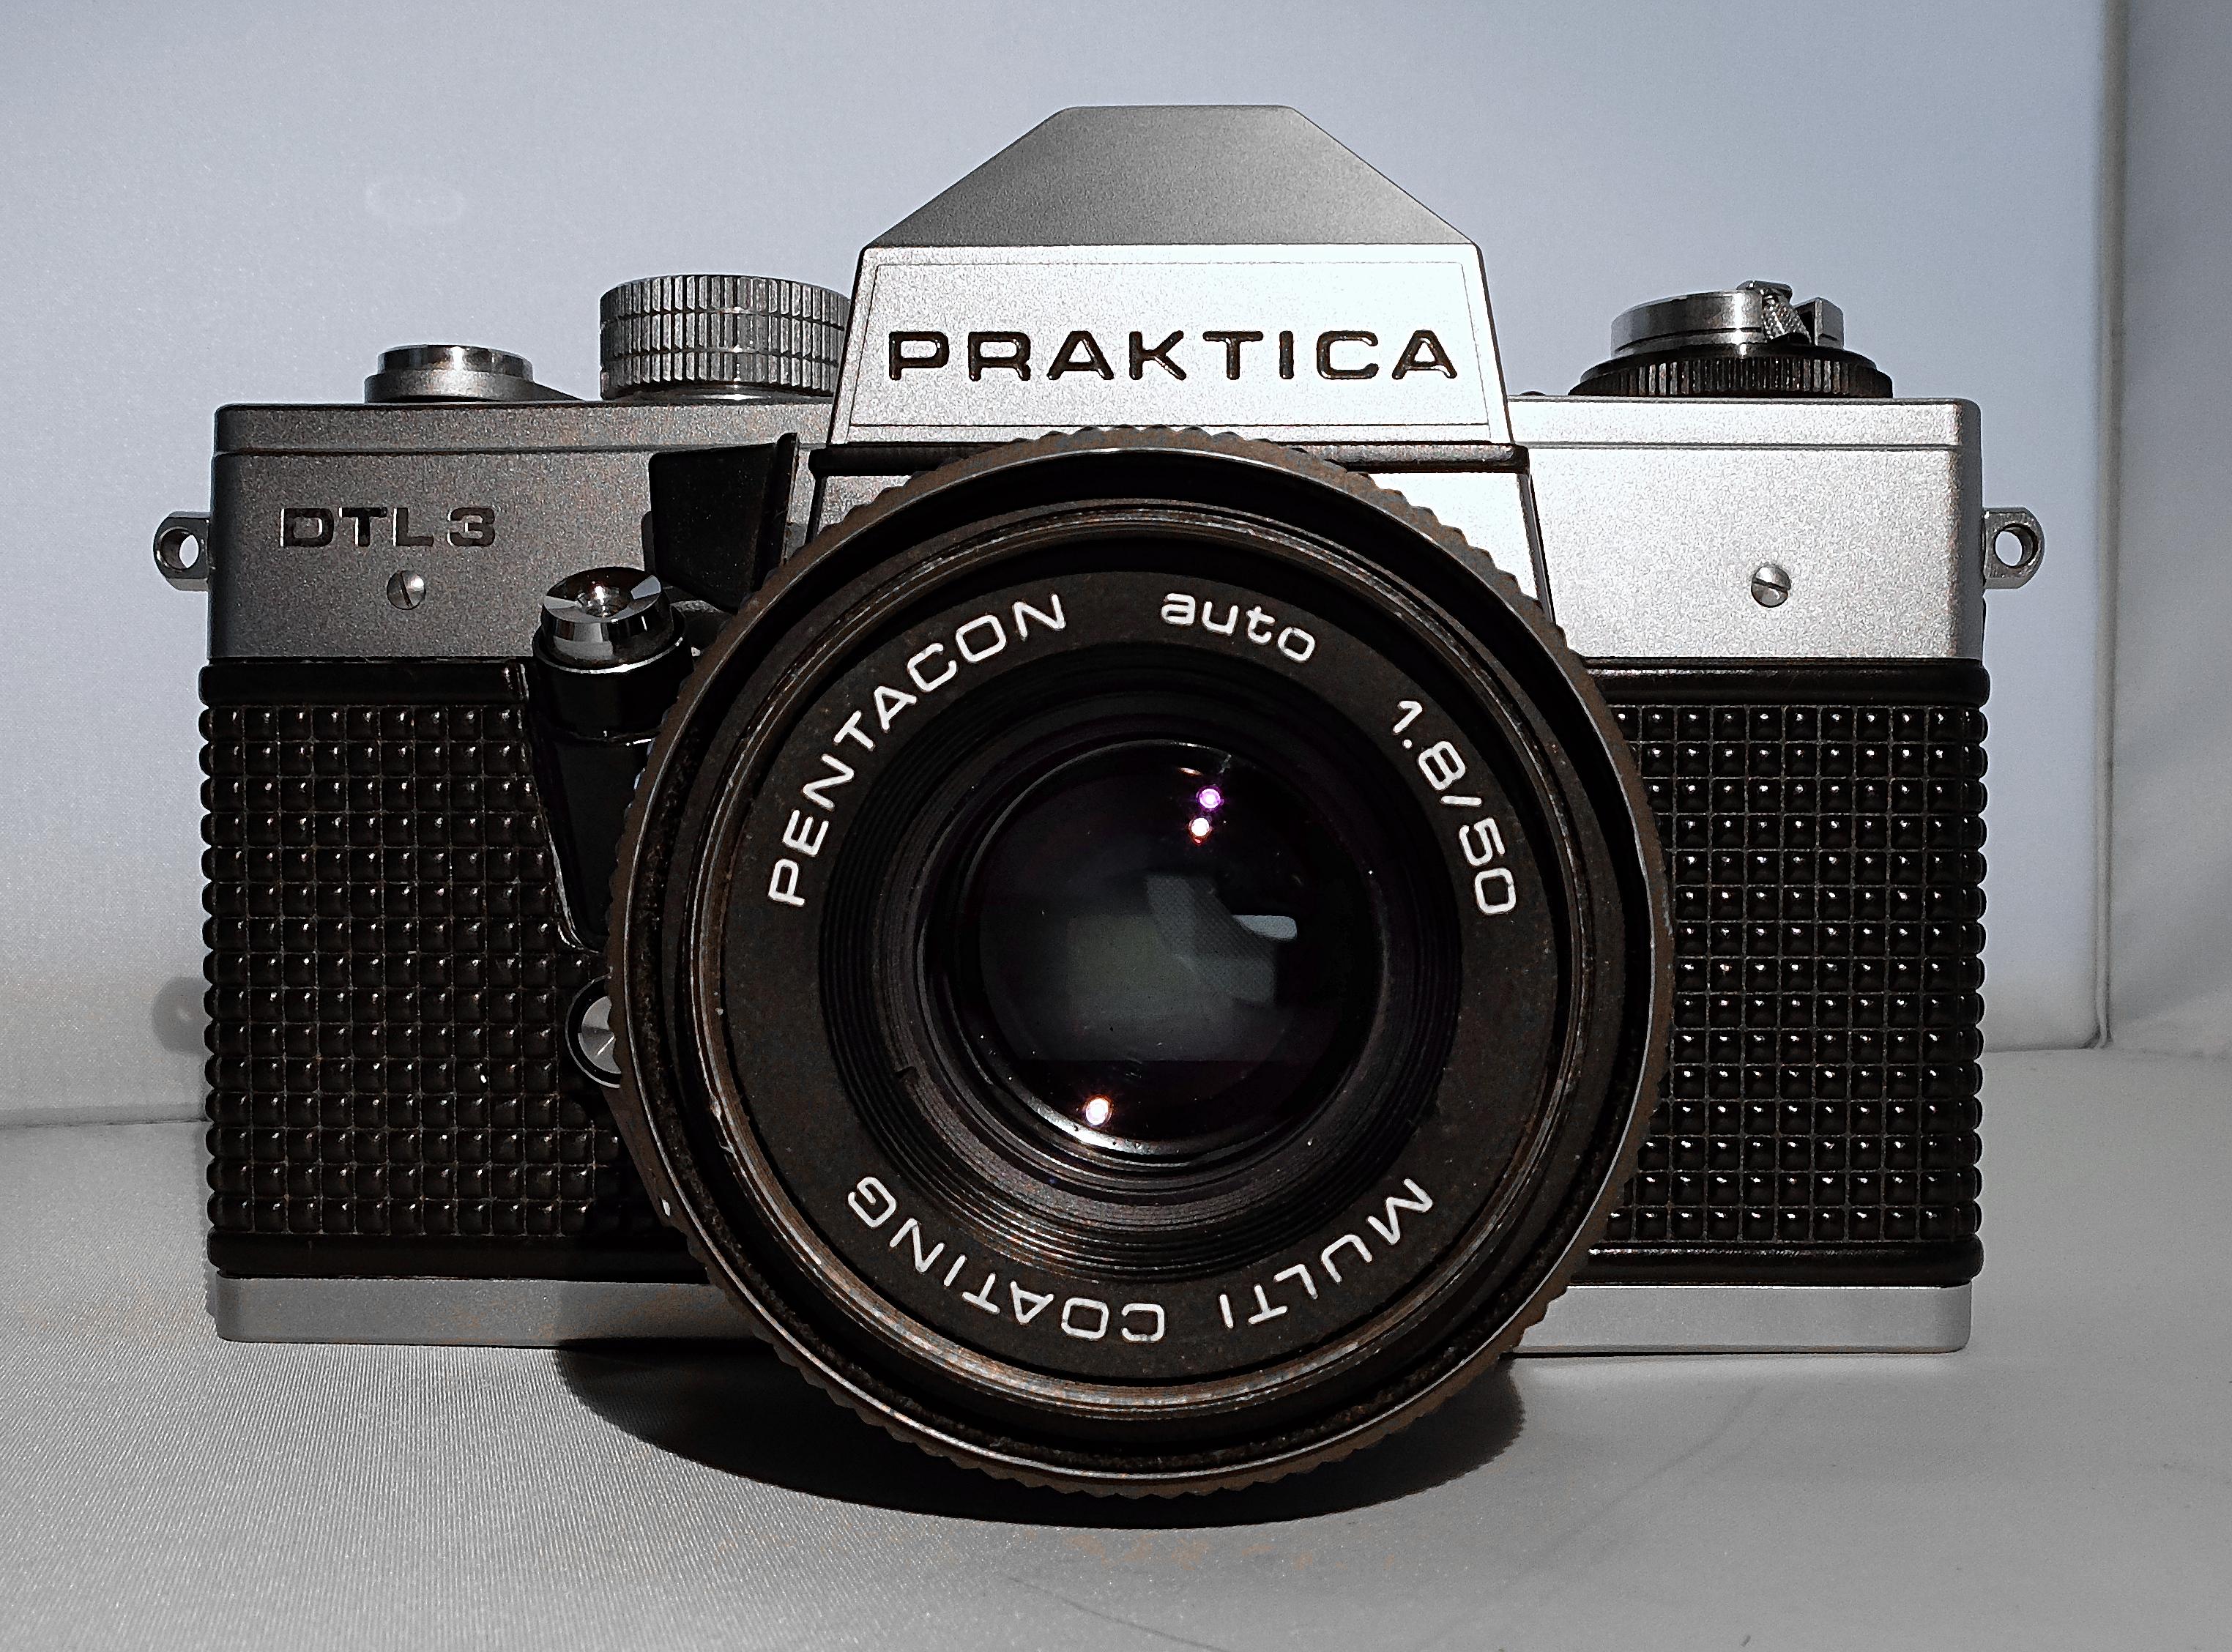 Analogkameras Analoge Fotografie Minolta Pocket Pak 440e Pocketkamera 110 Mit Blitz